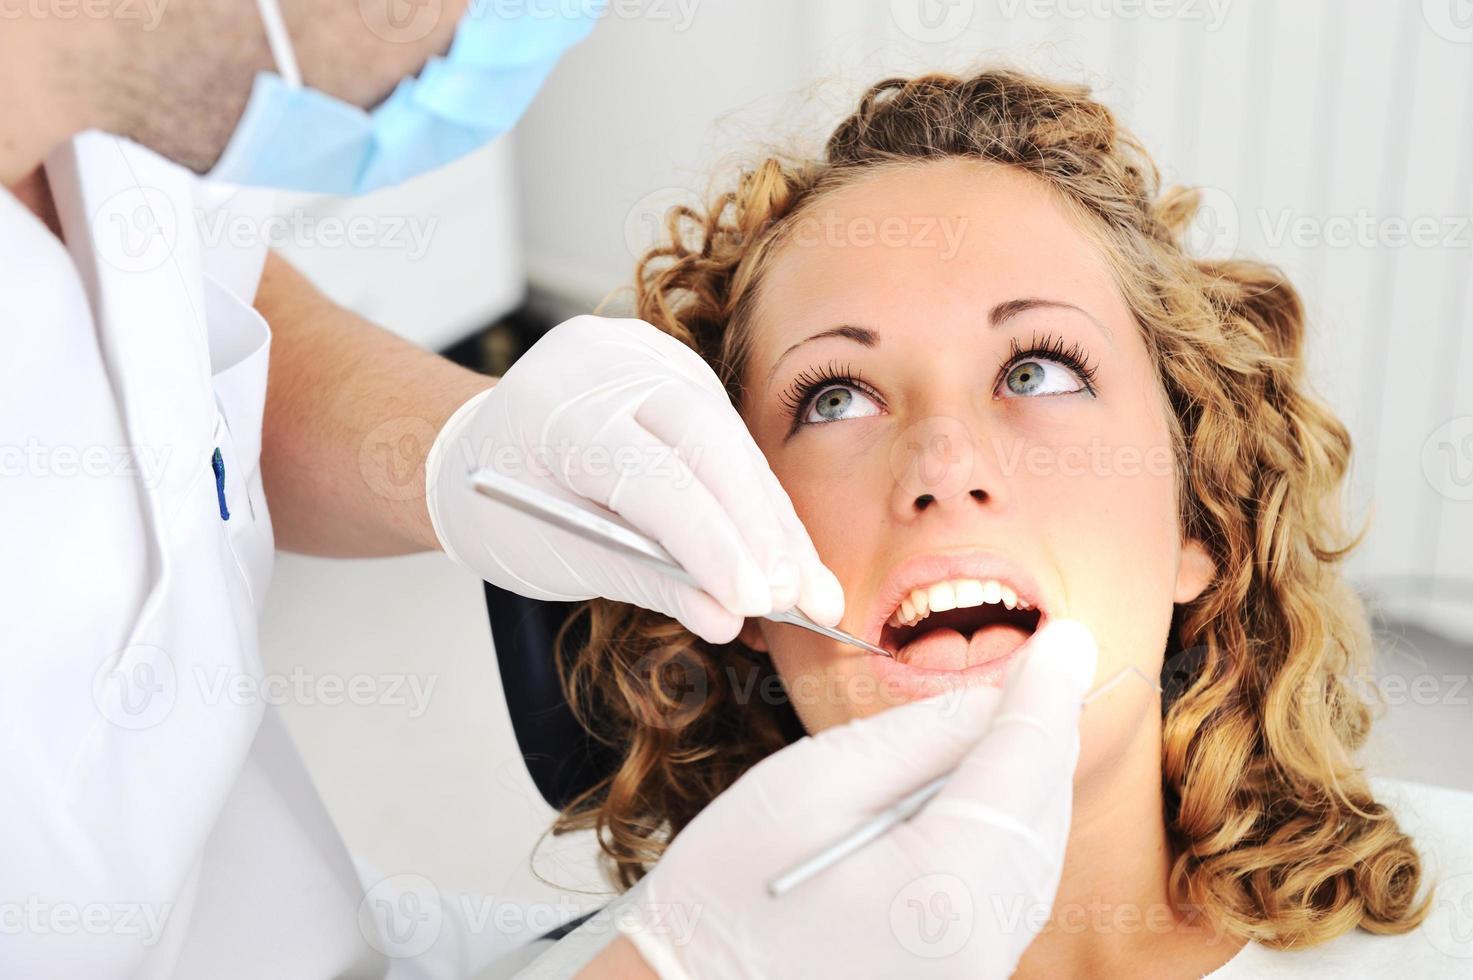 examen des dents du dentiste, série de photos connexes